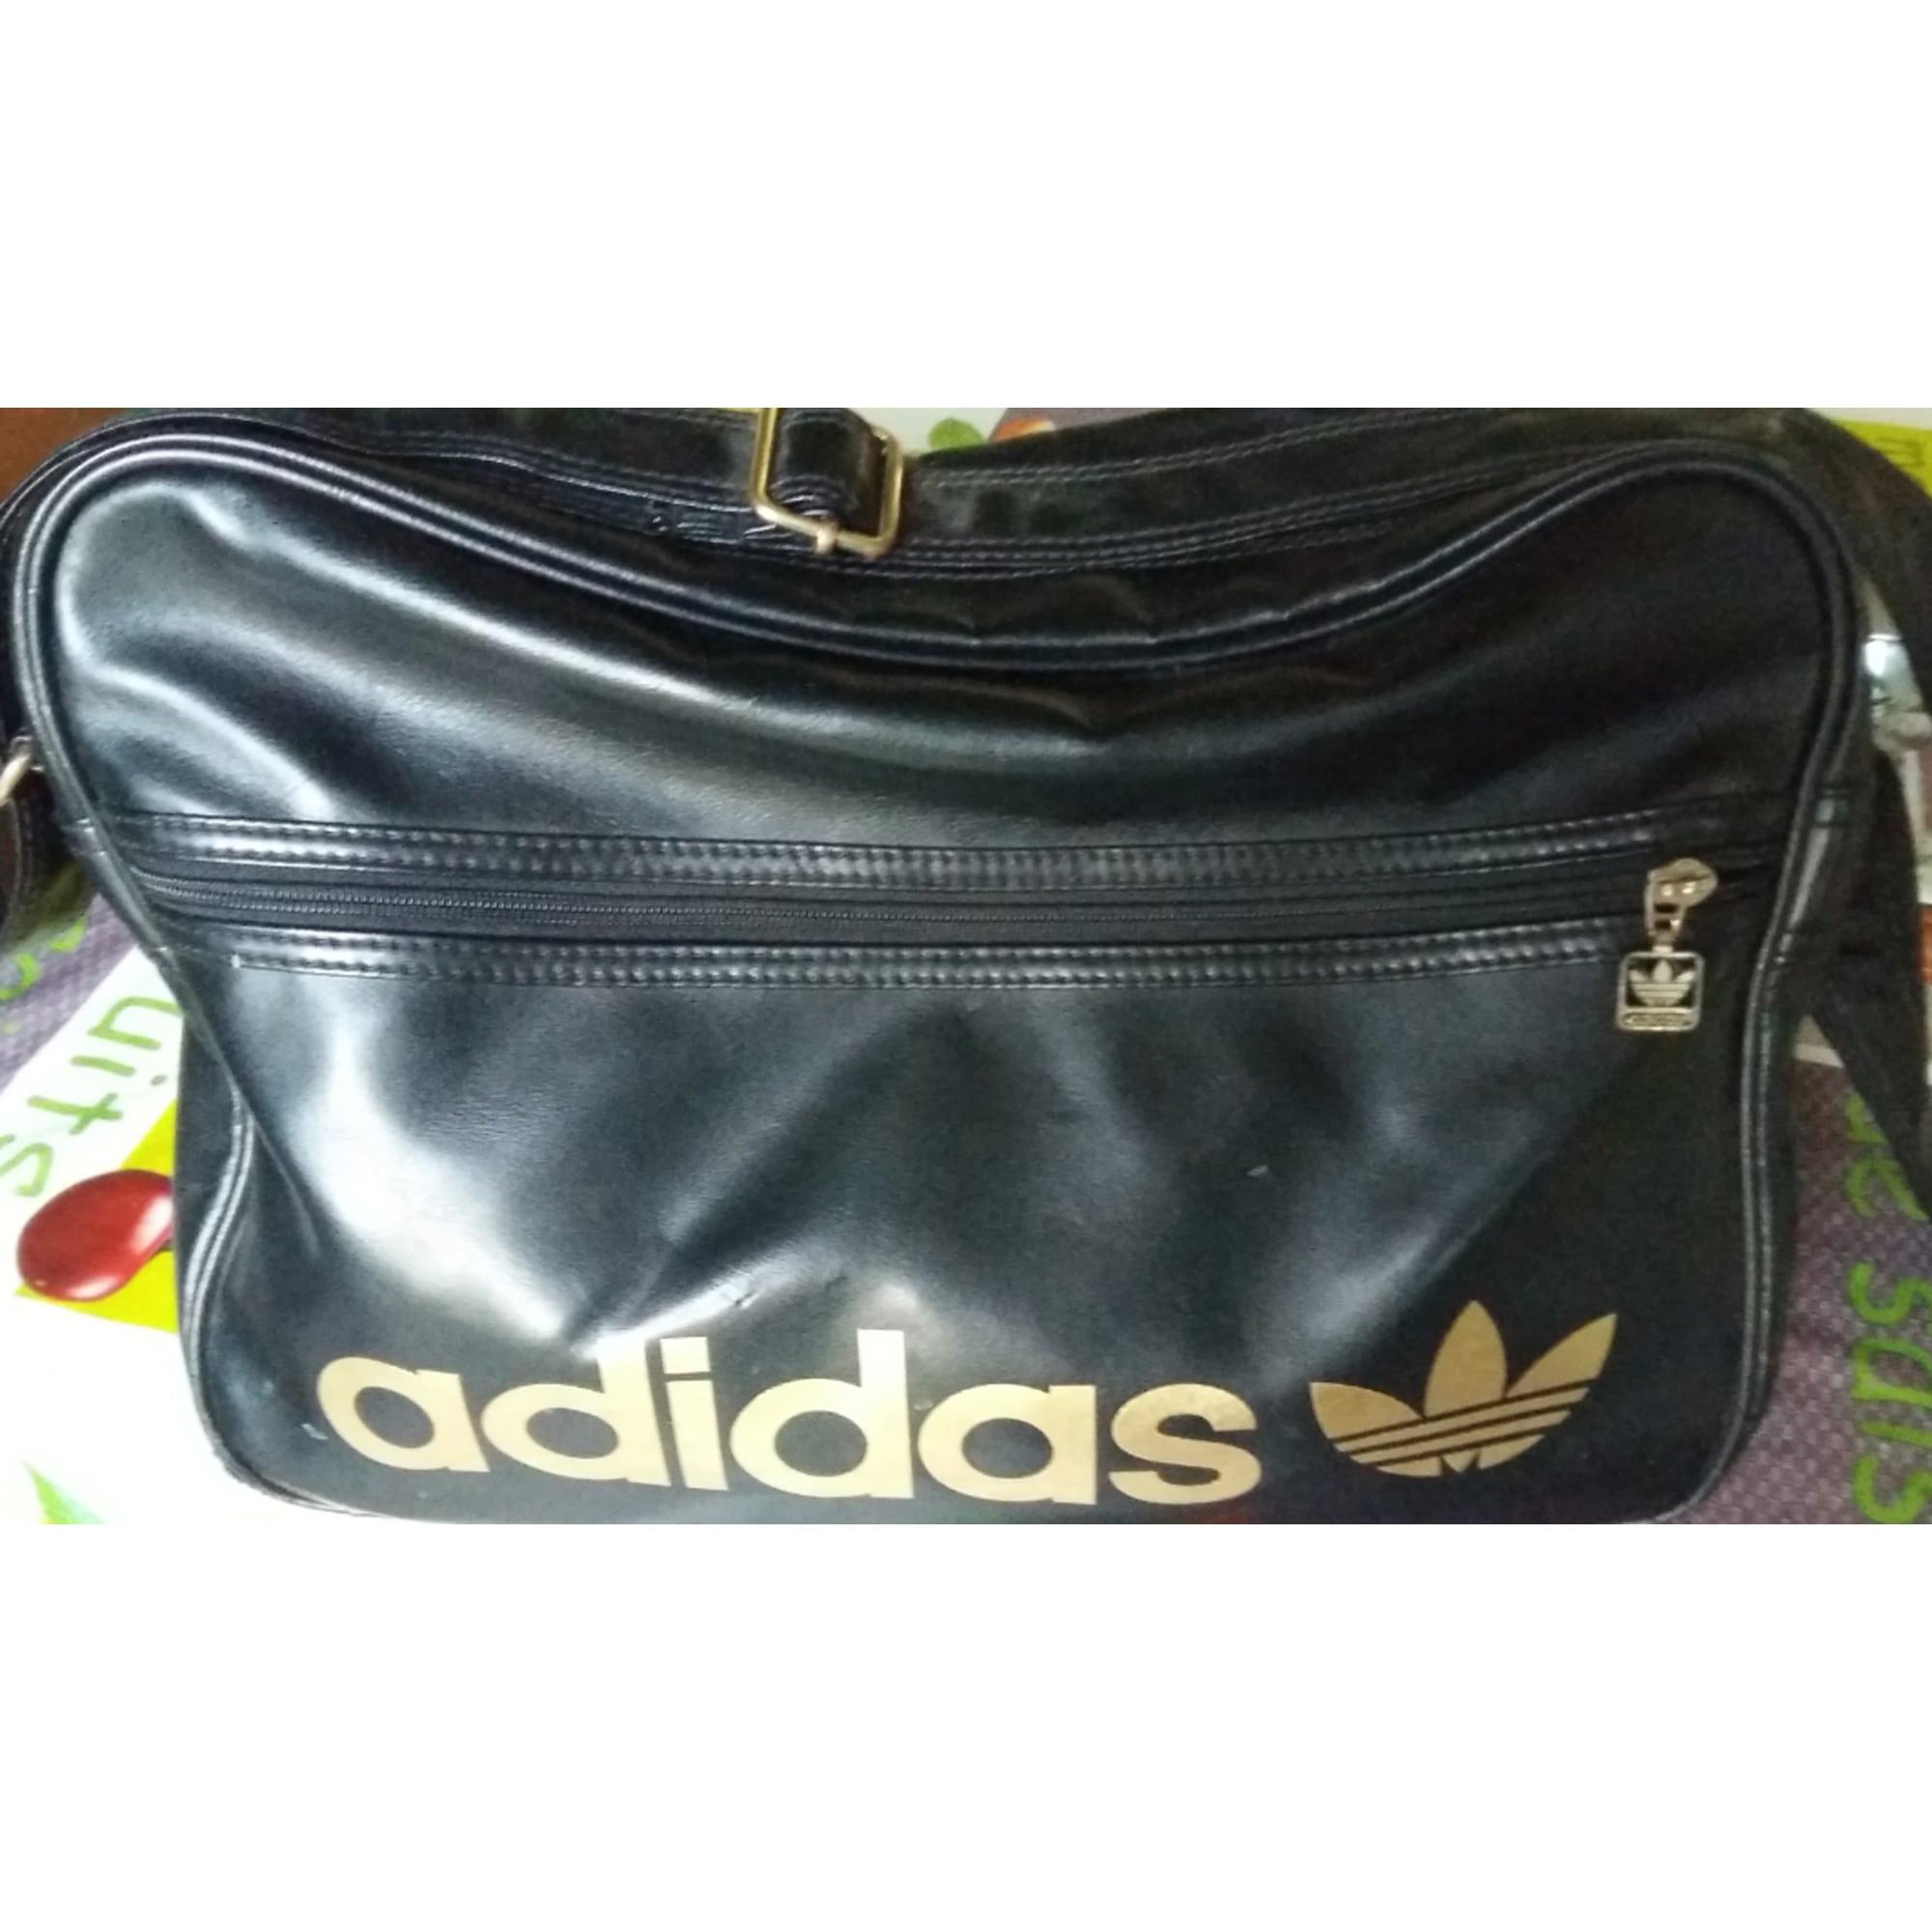 Sac Adidas Bandouliere 1